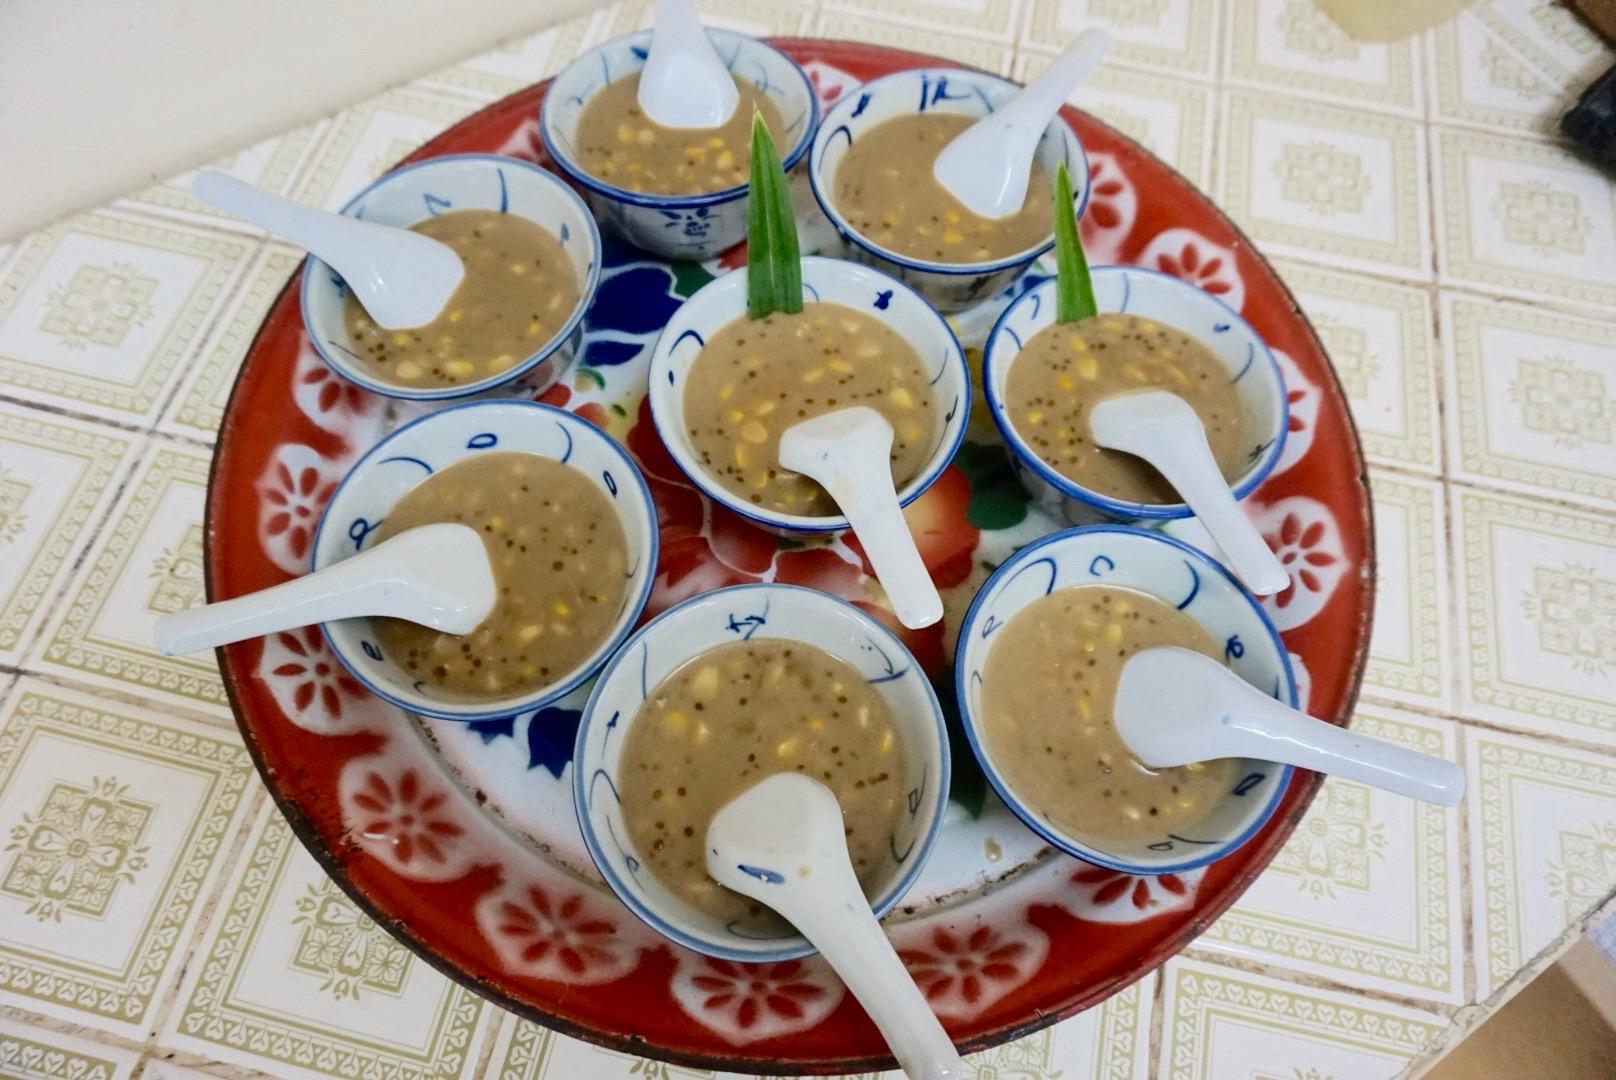 Sweetcorn and Sago in Coconut Milk